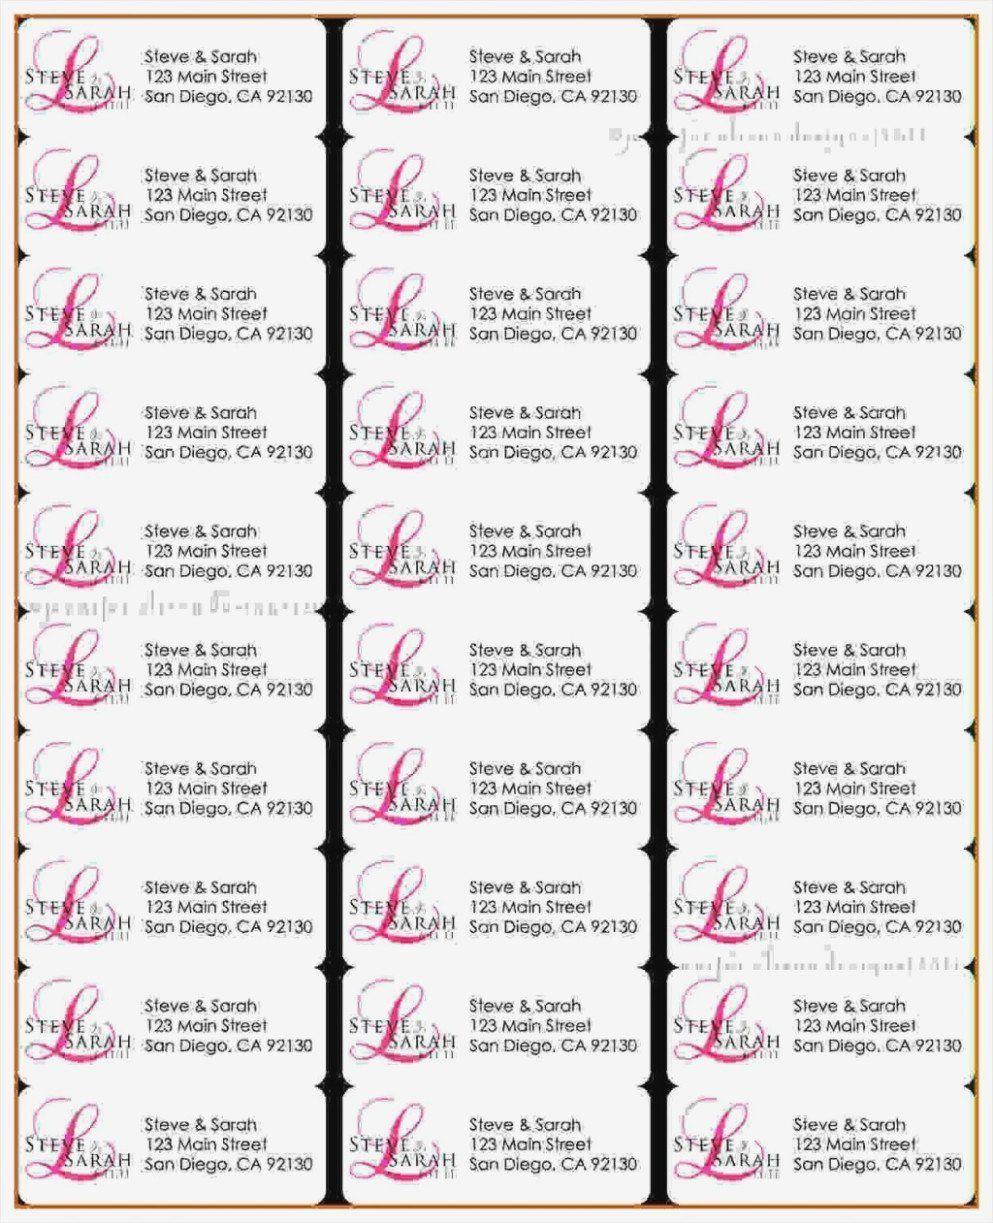 003 Wondrou Return Addres Label Template Sample  Google Doc Avery 80 Per Sheet Word FreeFull